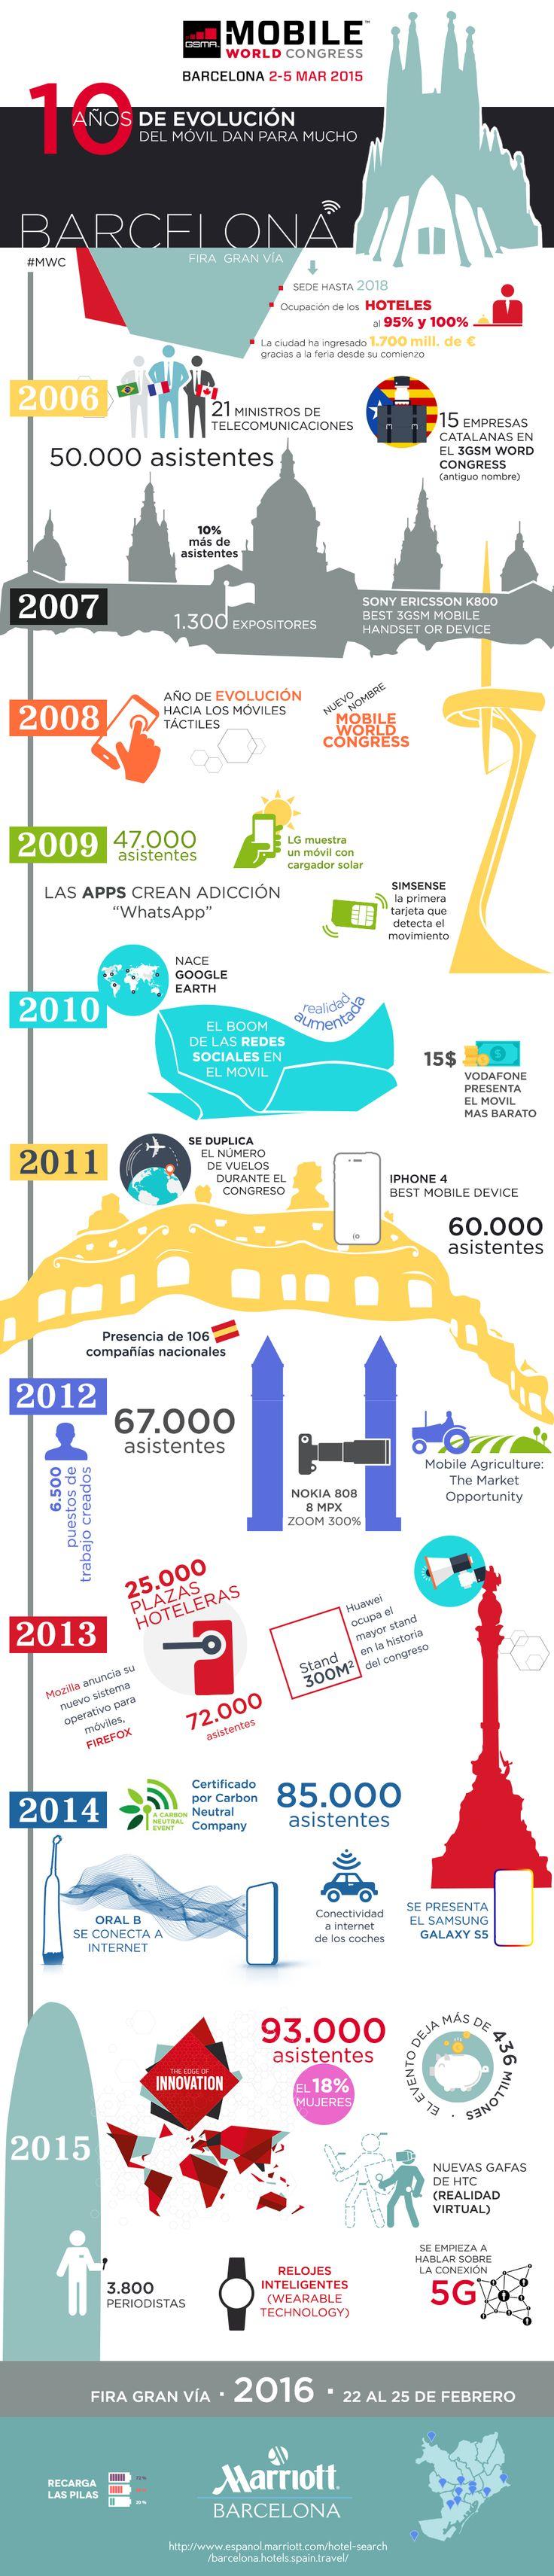 Mobile World Congress: 10 años de historia en Barcelona [Marriot Barcelona] www.rubendelaosa.com